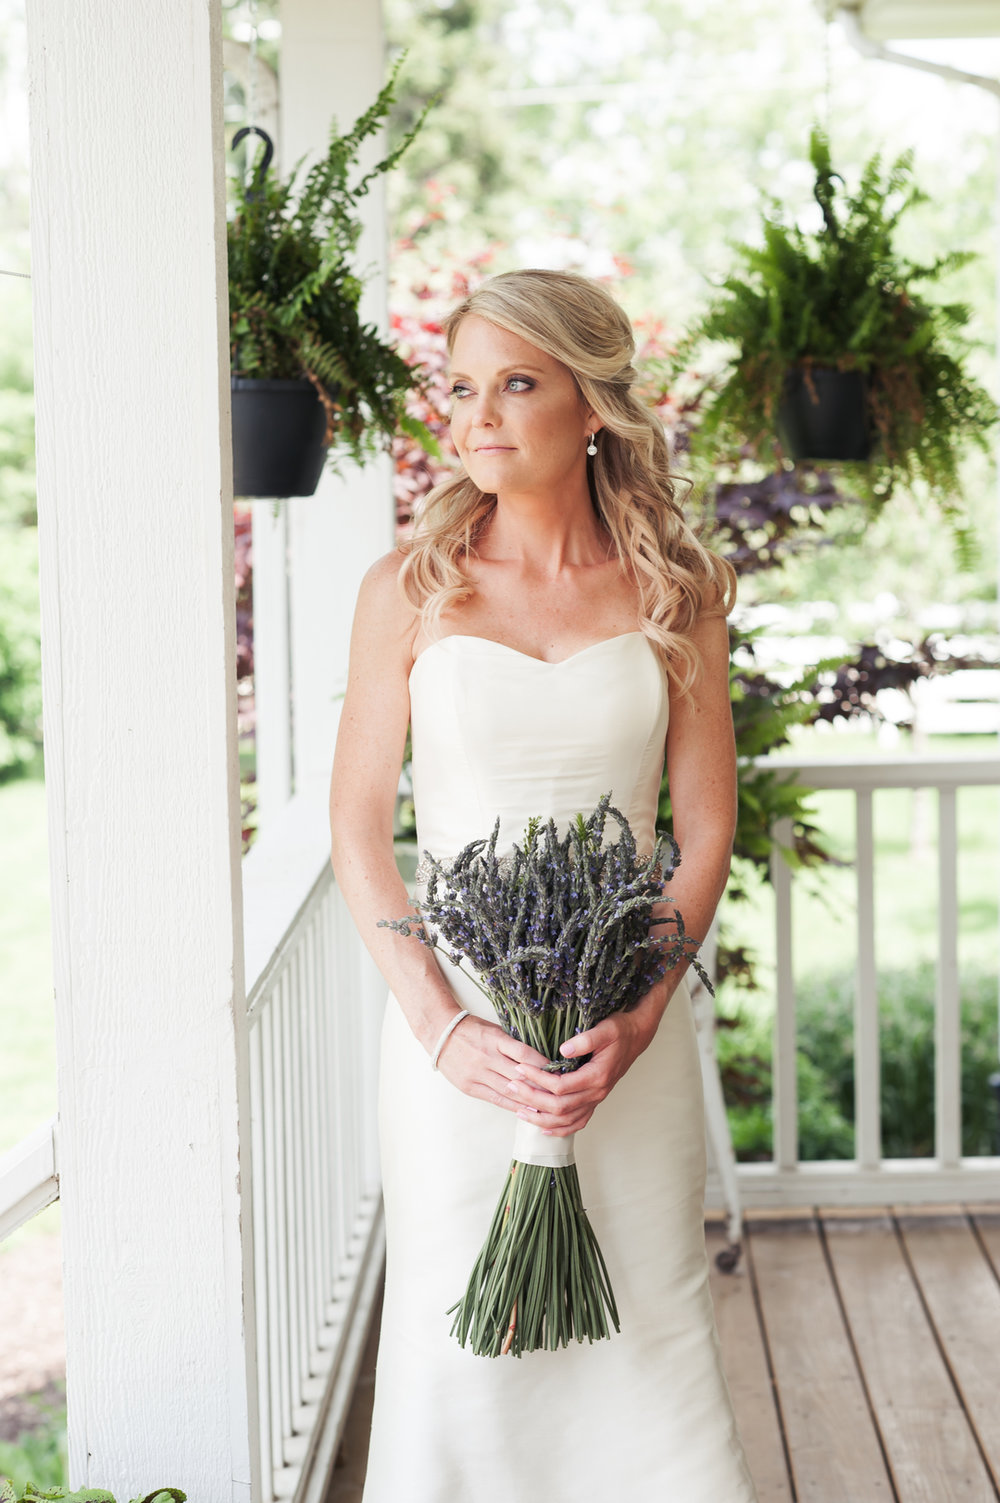 Elegant Bridal Gown with Lavender Bouquet Chicago Farm Wedding Elite Photo